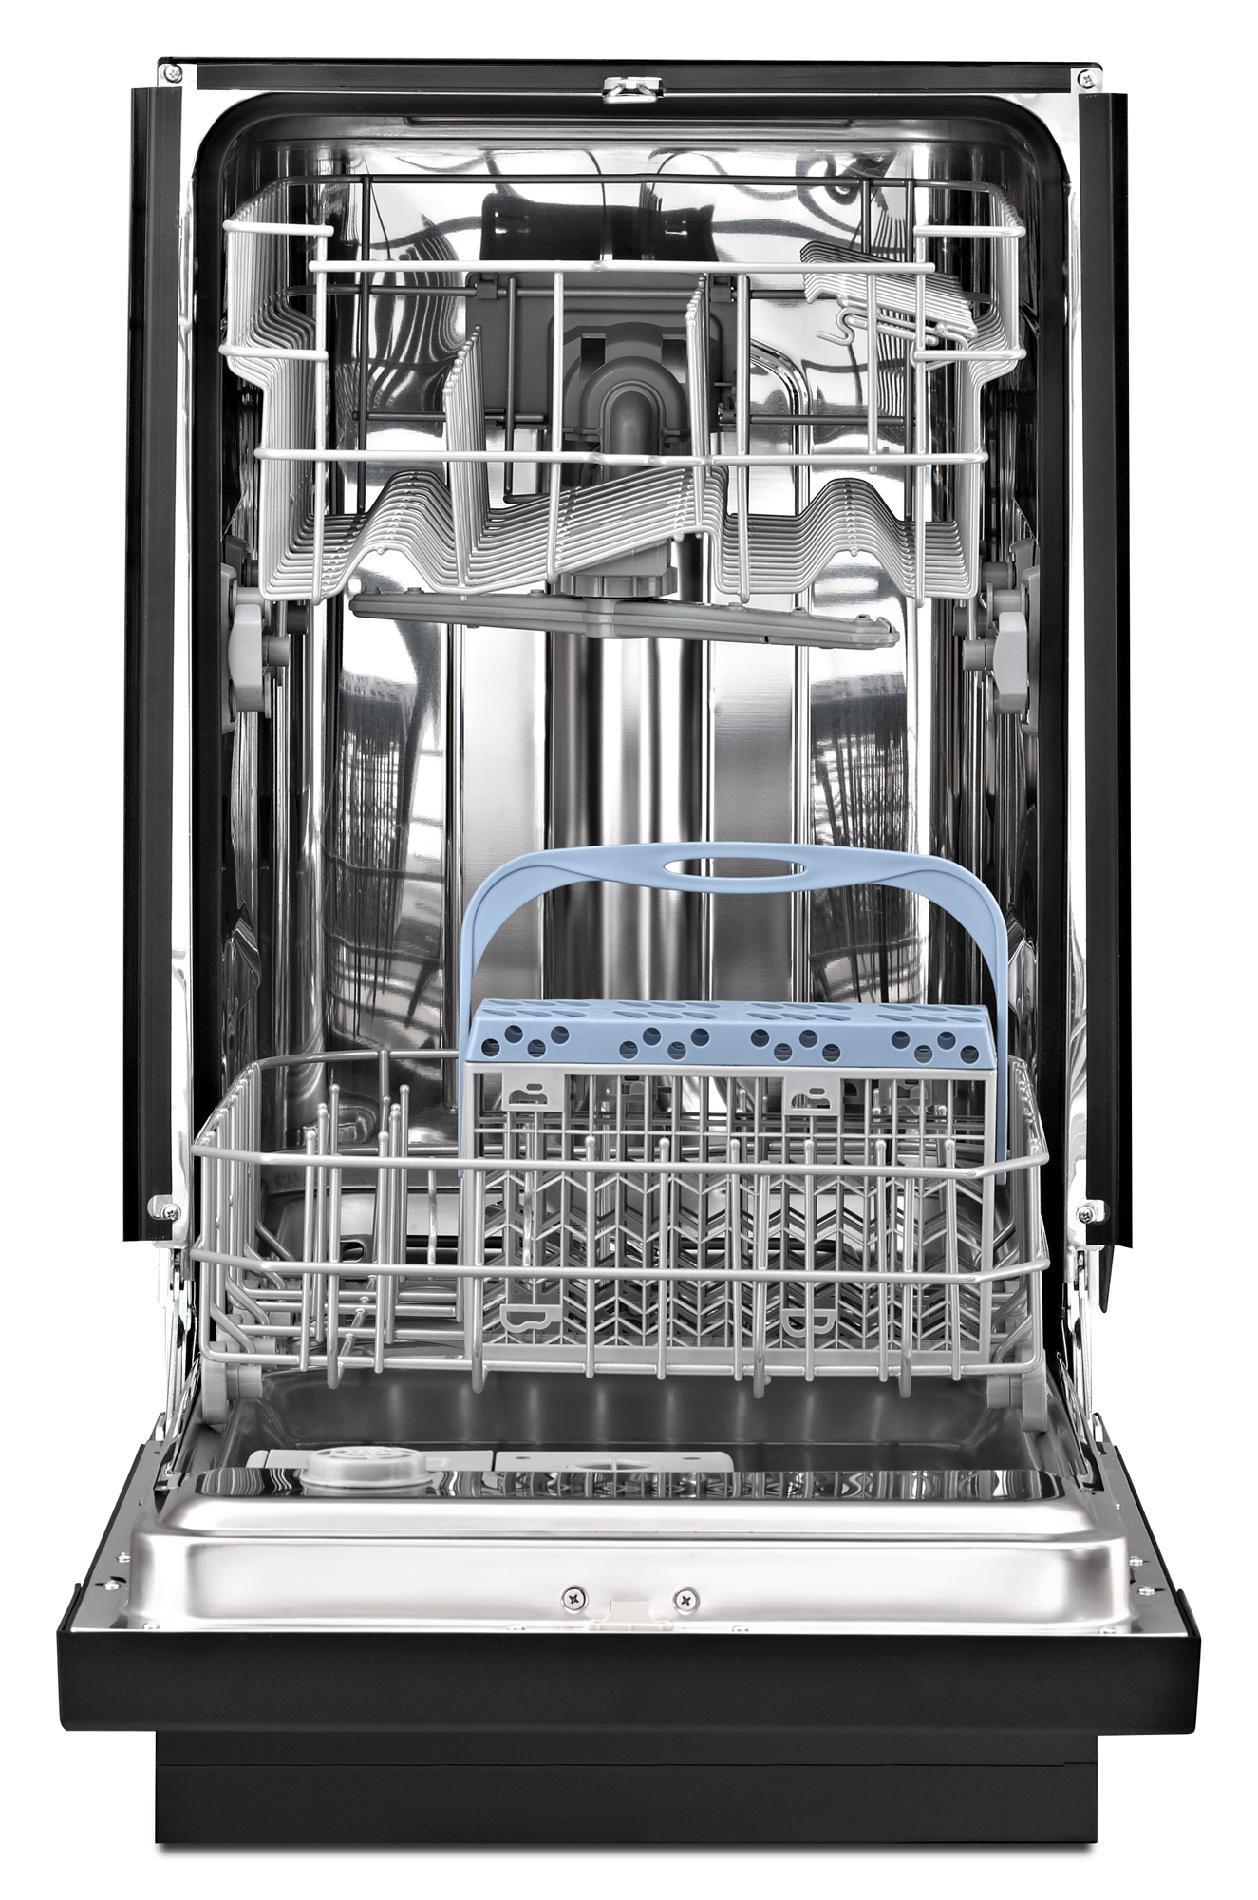 "Whirlpool WDF518SAAB 18"" Built-In Dishwasher w/ 100% Stainless Steel Tub - Black"